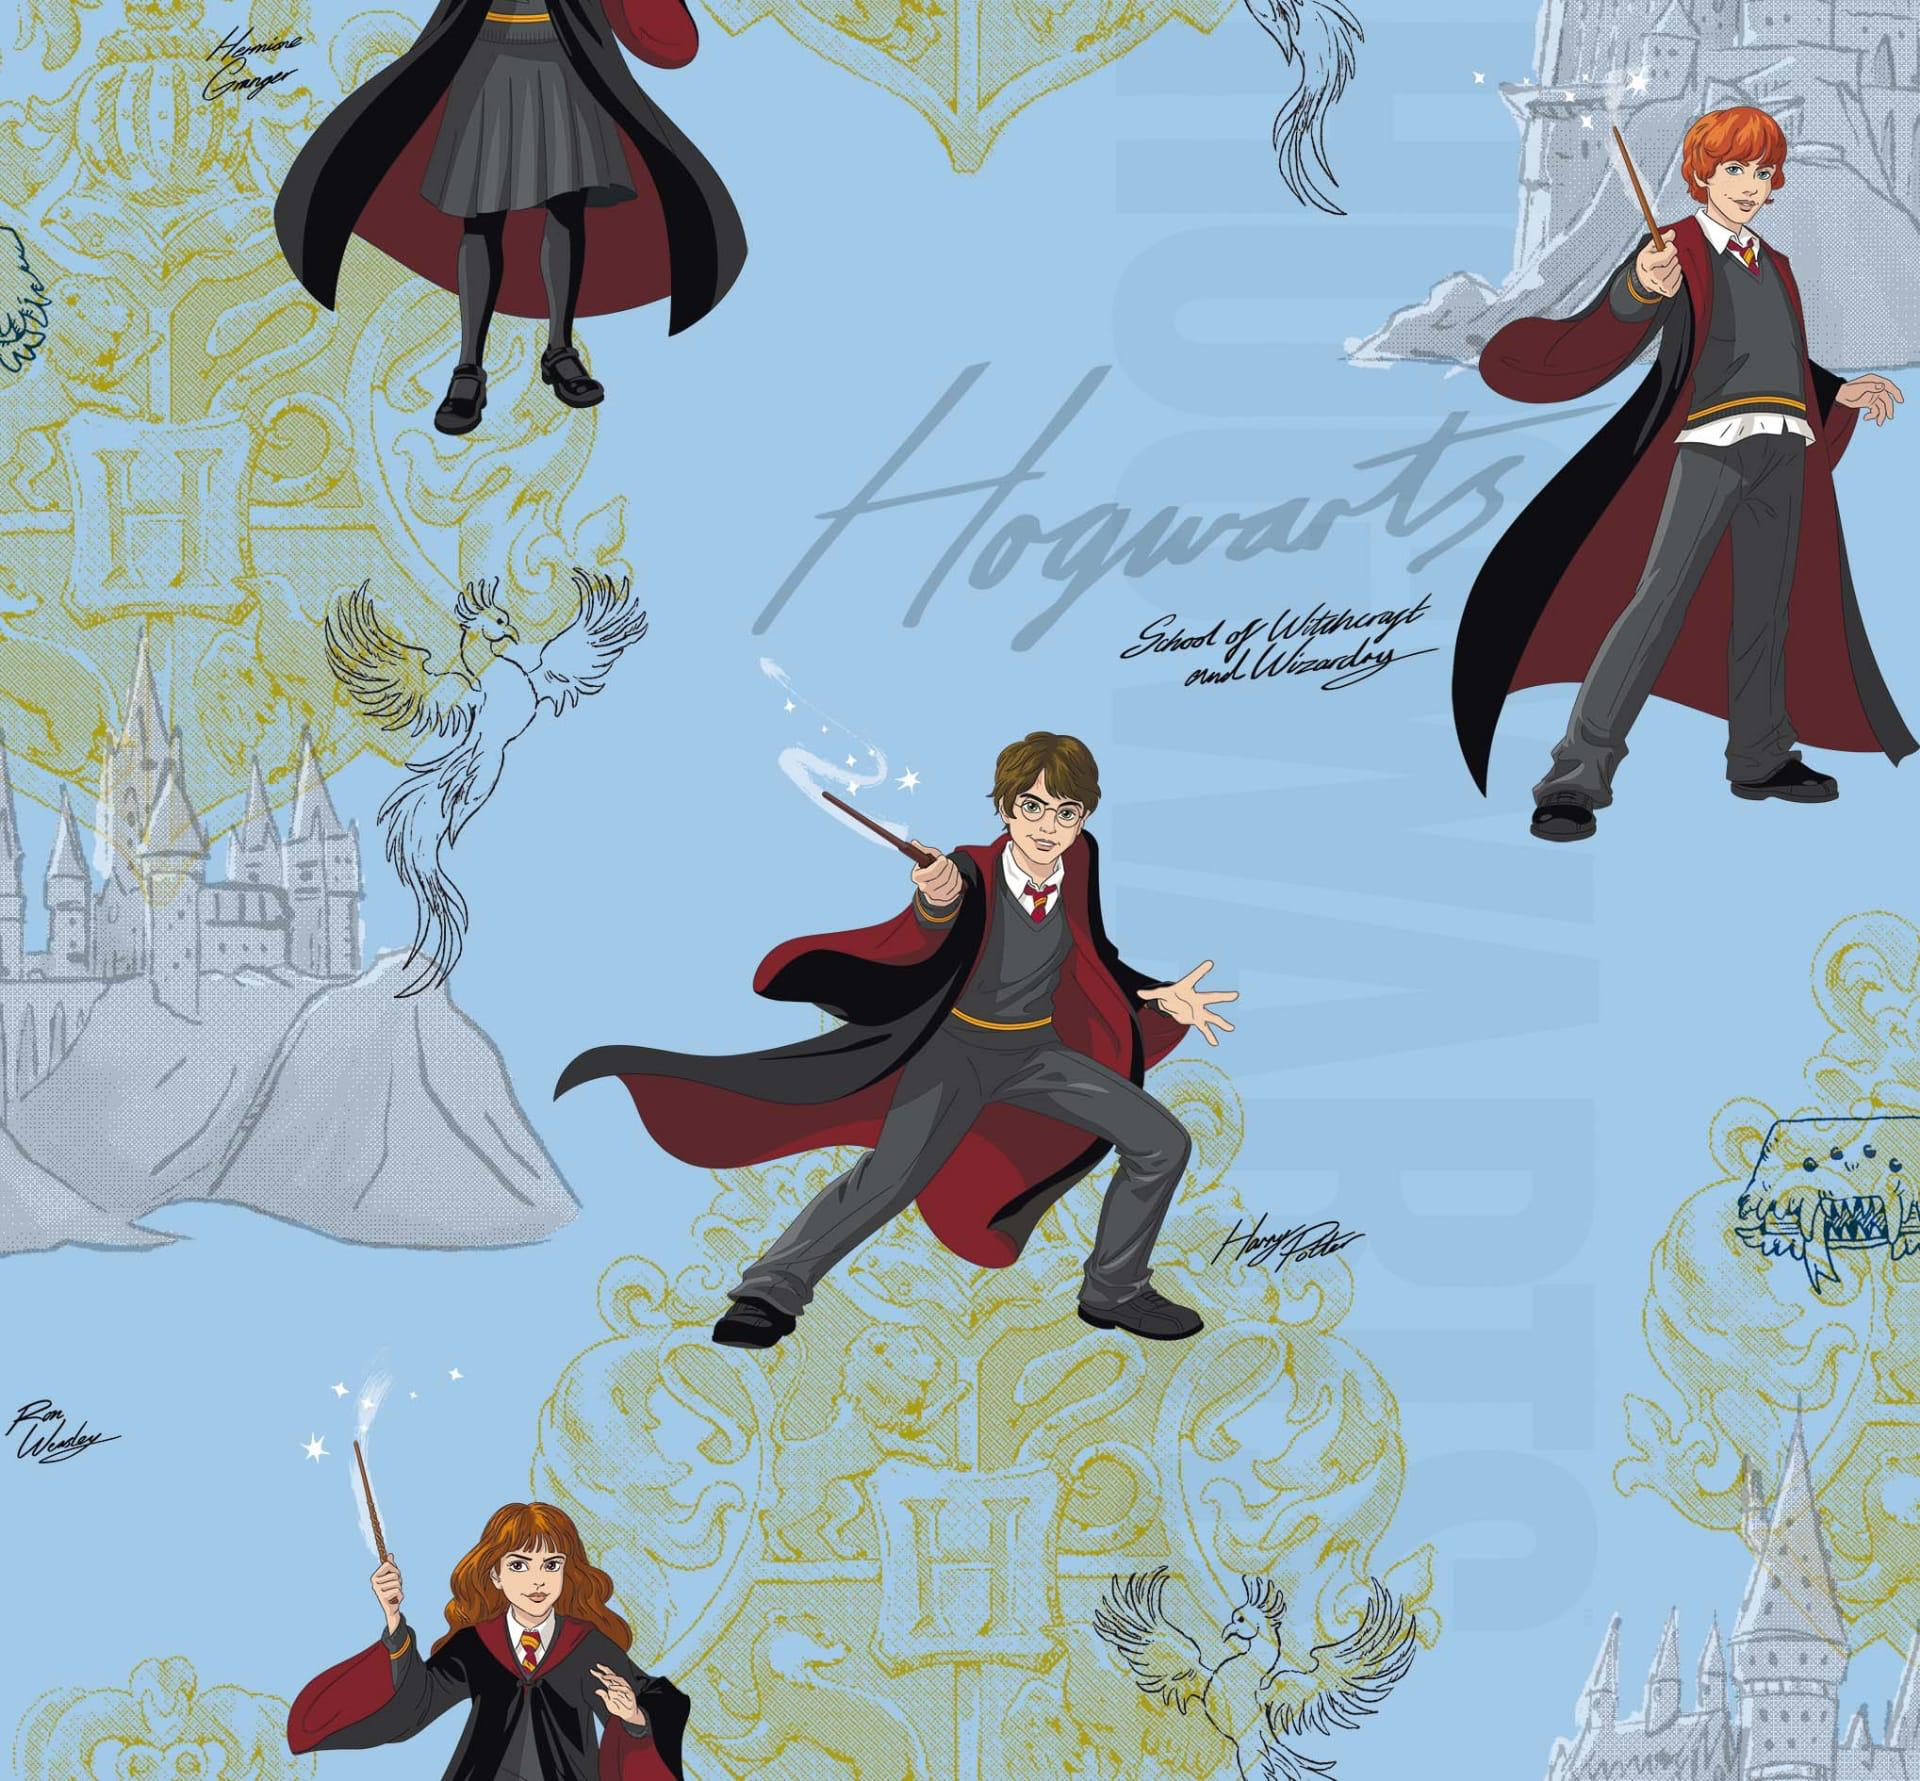 Harry Potter - Wizarding